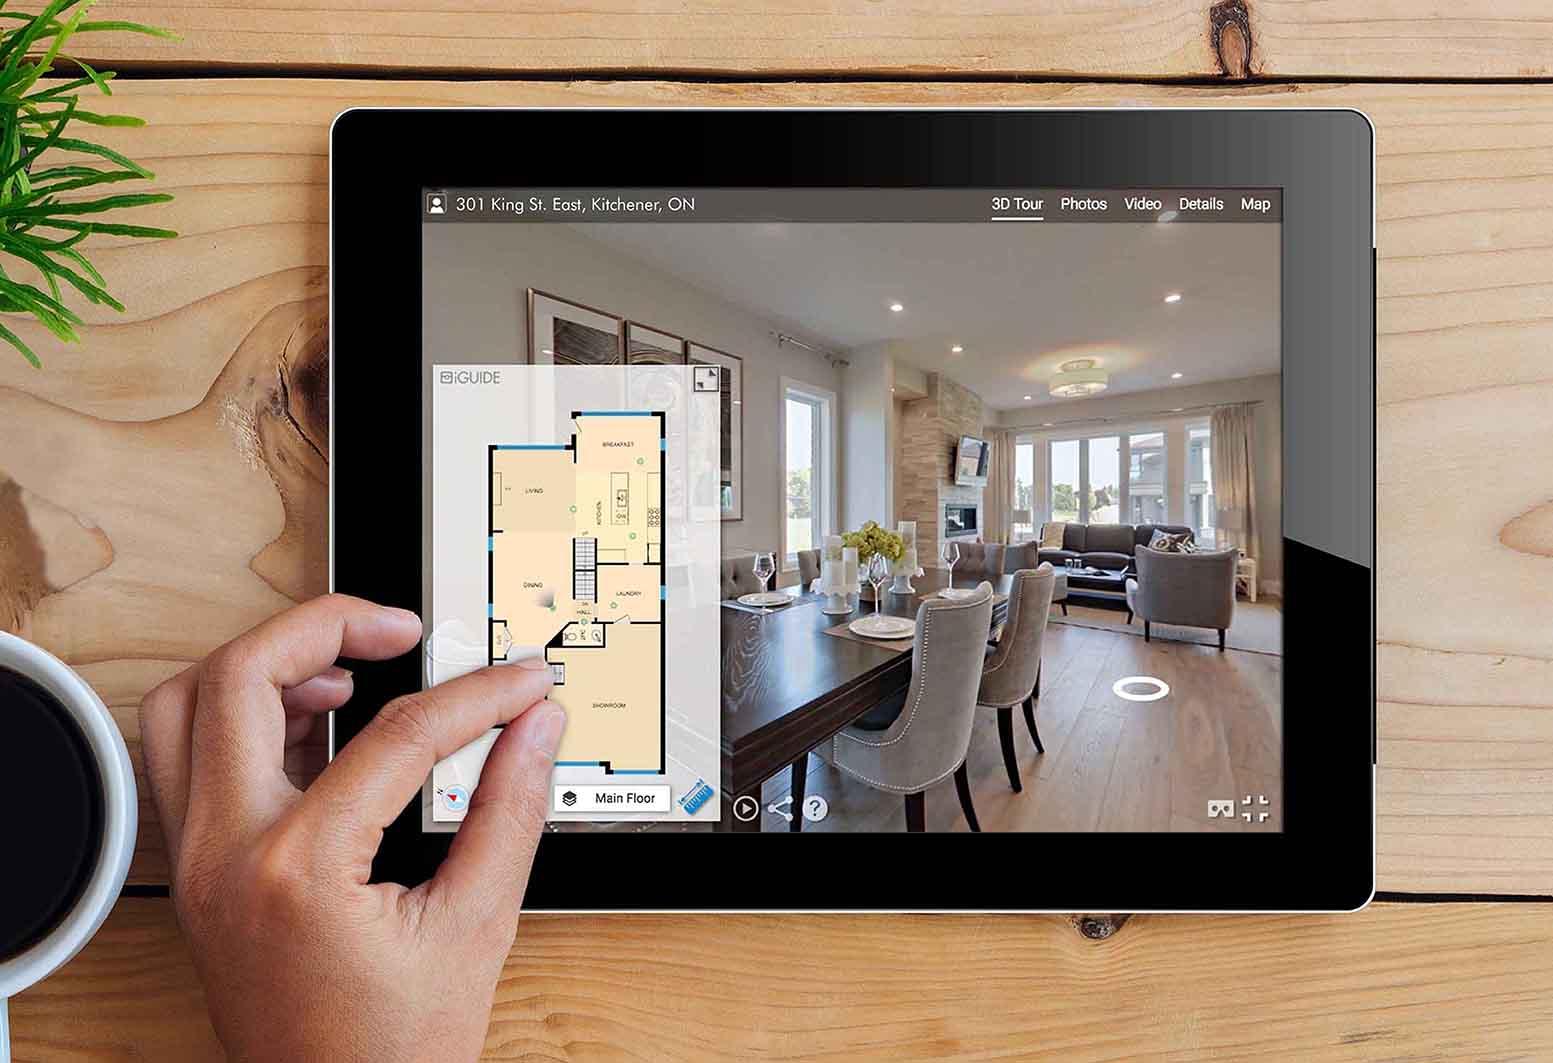 Denver Real Estate Photographer creates 360 3D virtual tours for Denver real estate photography